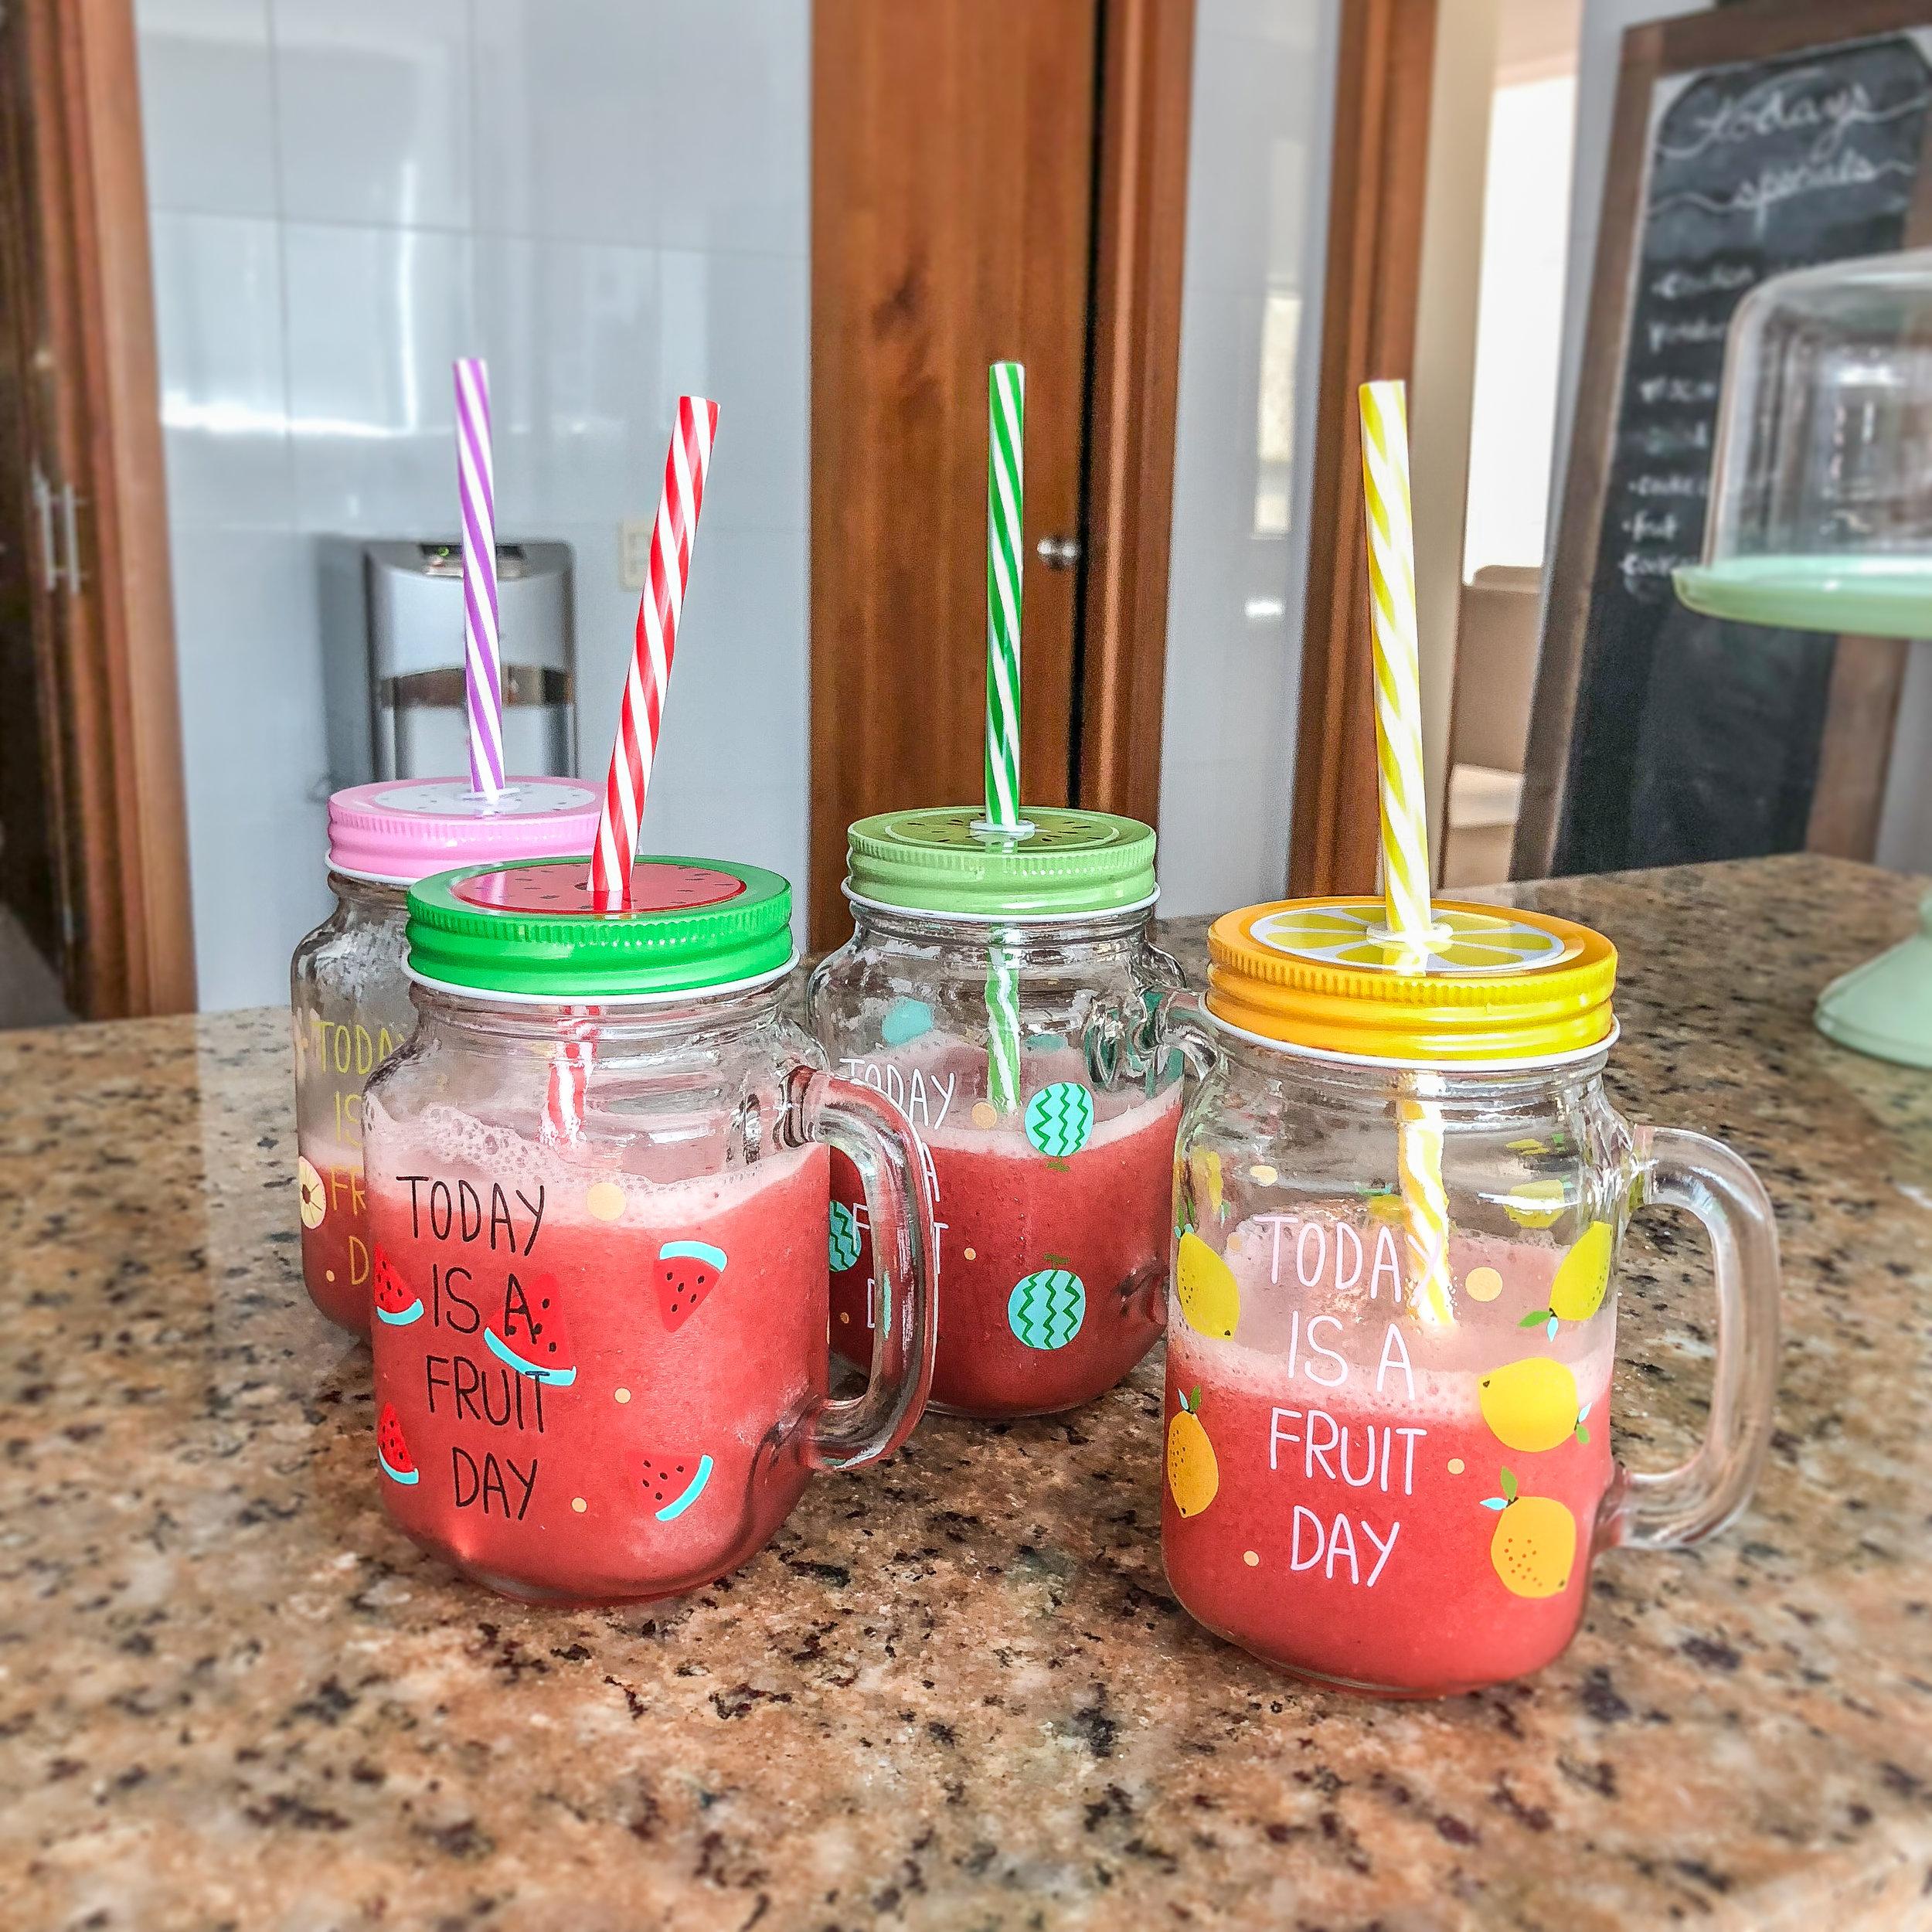 Finished jugo de fresa. Enjoy! -